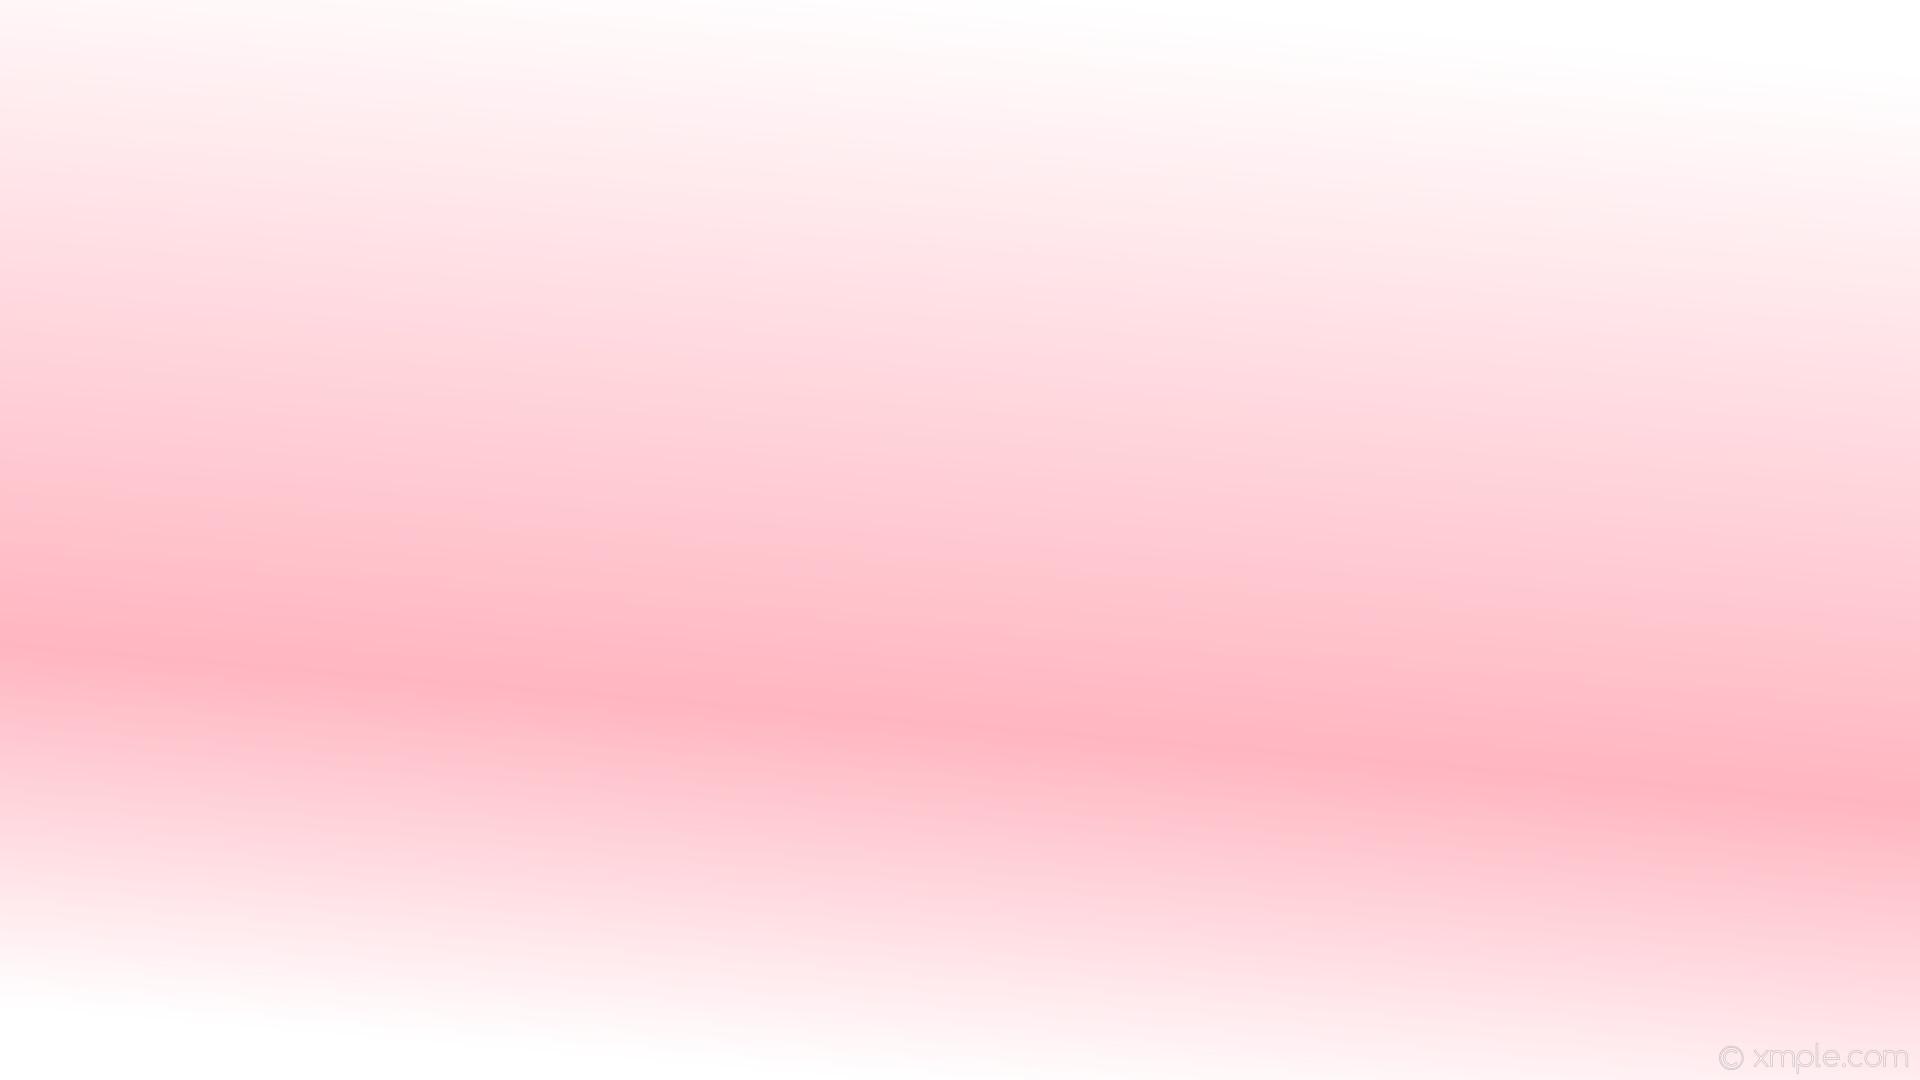 Res: 1920x1080, wallpaper pink white gradient highlight linear light pink #ffffff #ffb6c1  255° 33%